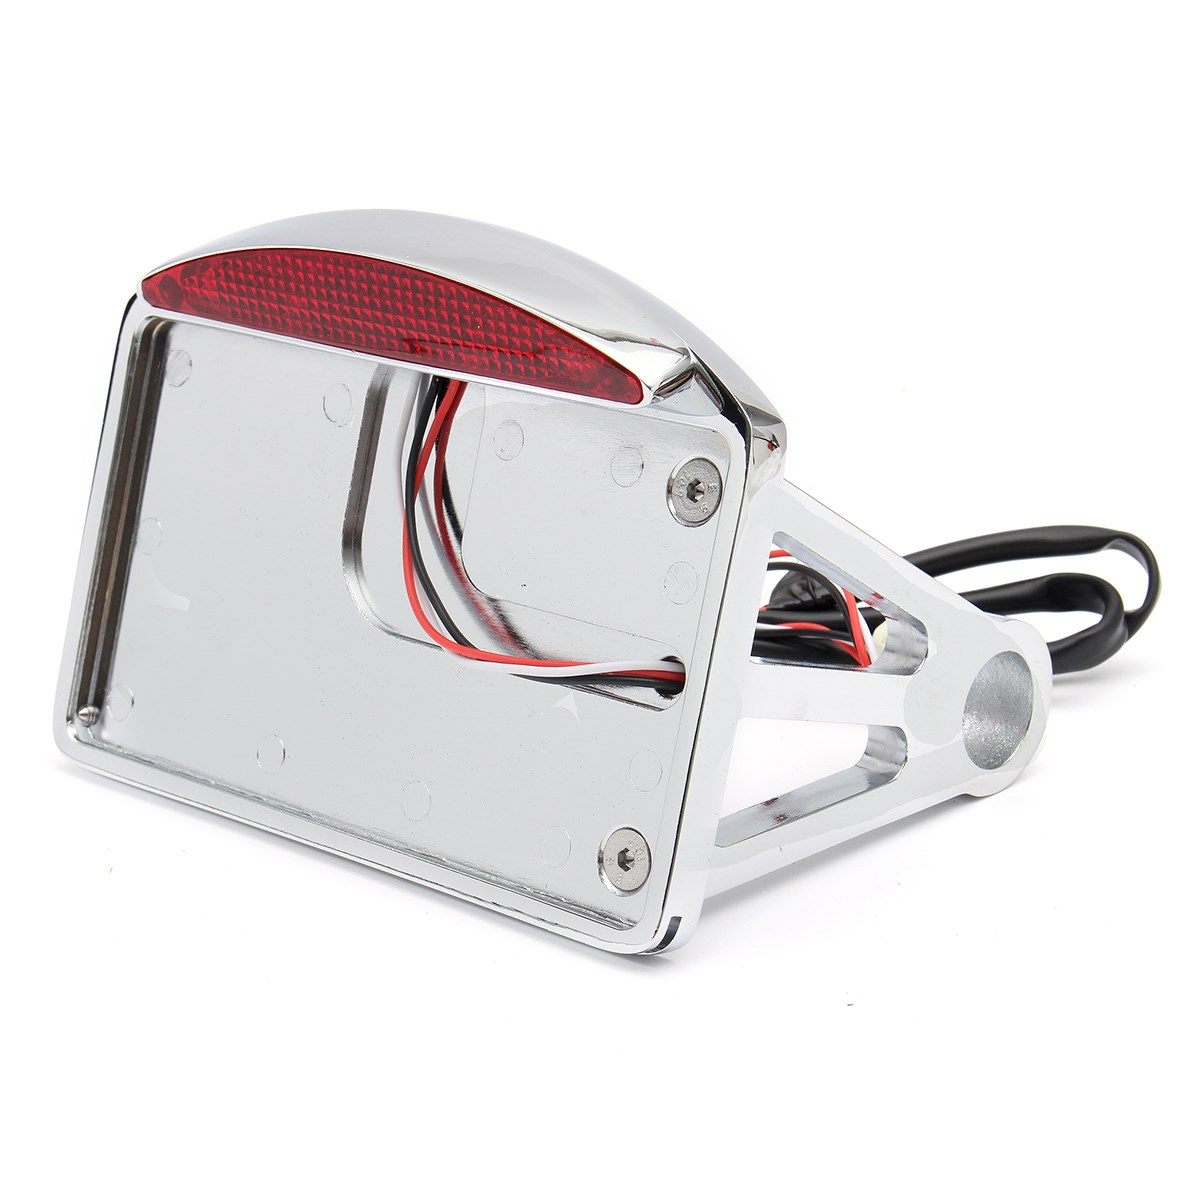 Motorcycle License Plate LED Tail font b Light b font Horizontal Side Mount Bracket Fit For